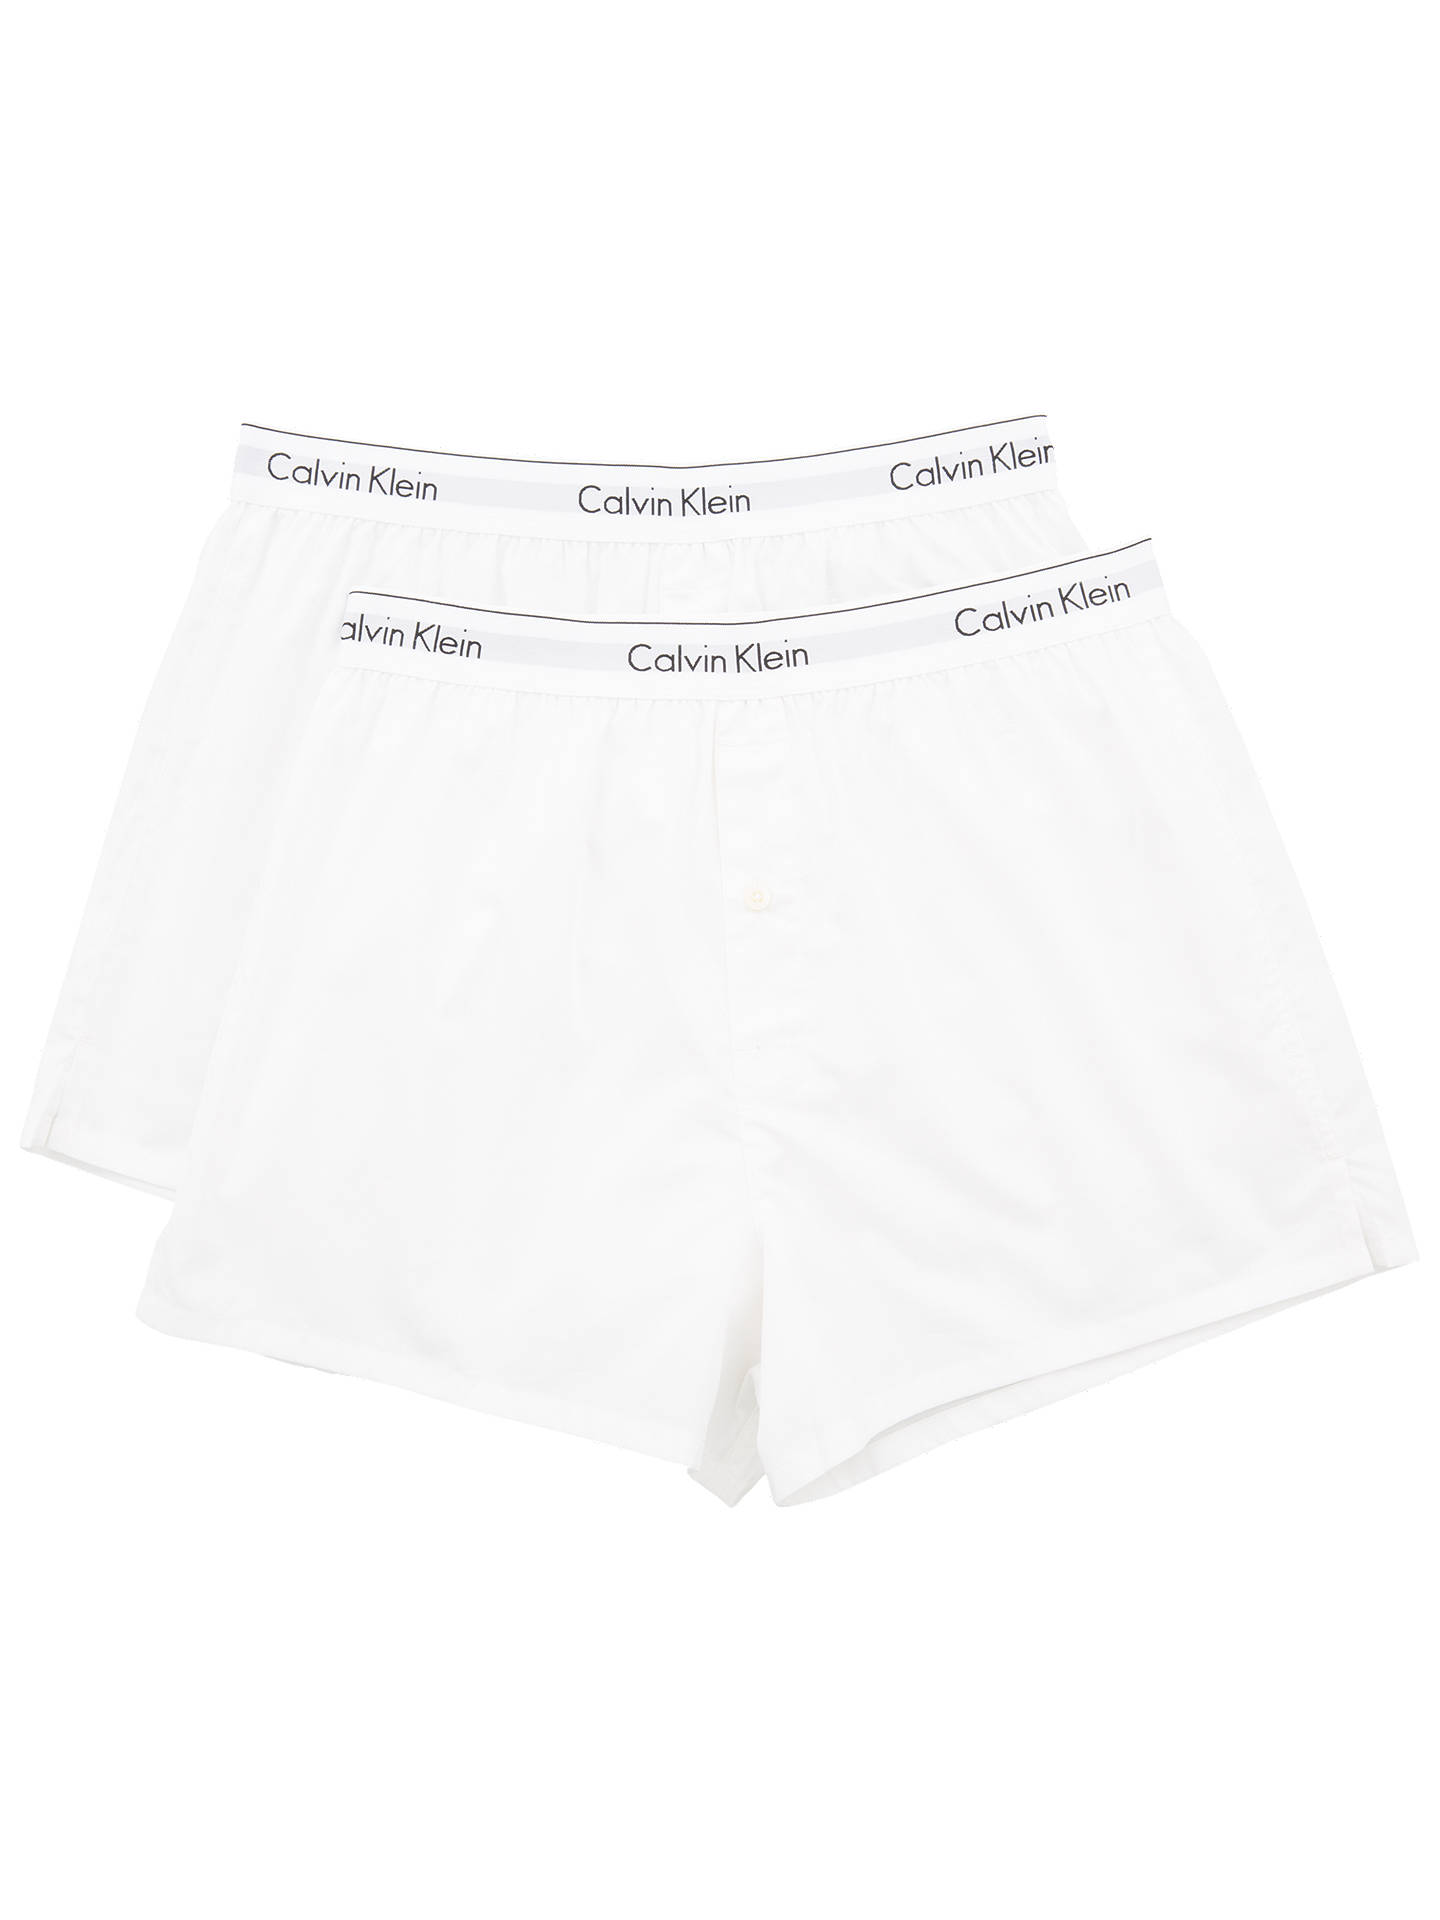 77a82c2b6762 Calvin Klein Modern Cotton Slim Fit Boxers, Pack of 2, White at John ...